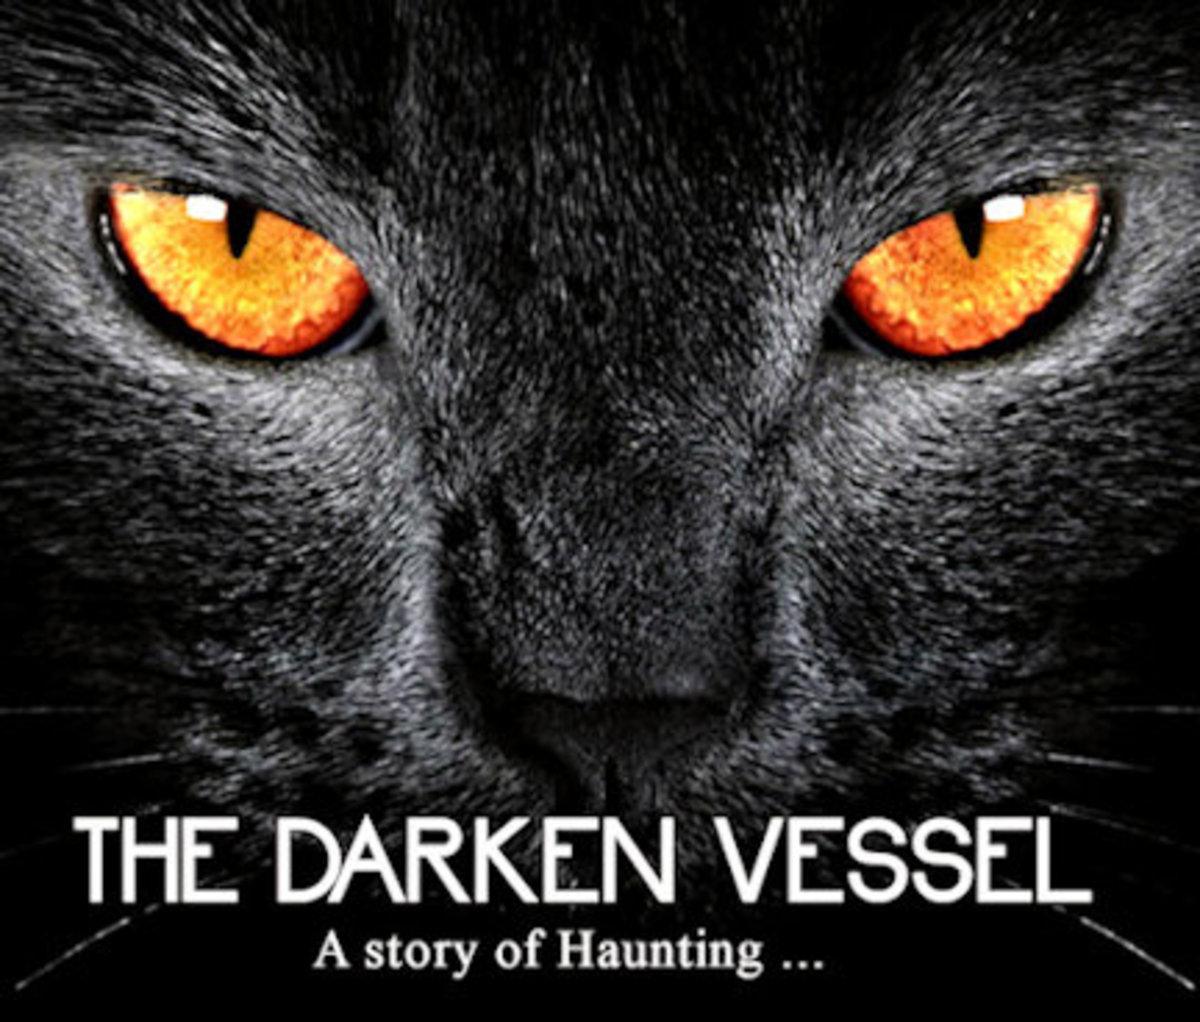 The Darken Vessel Conclusion